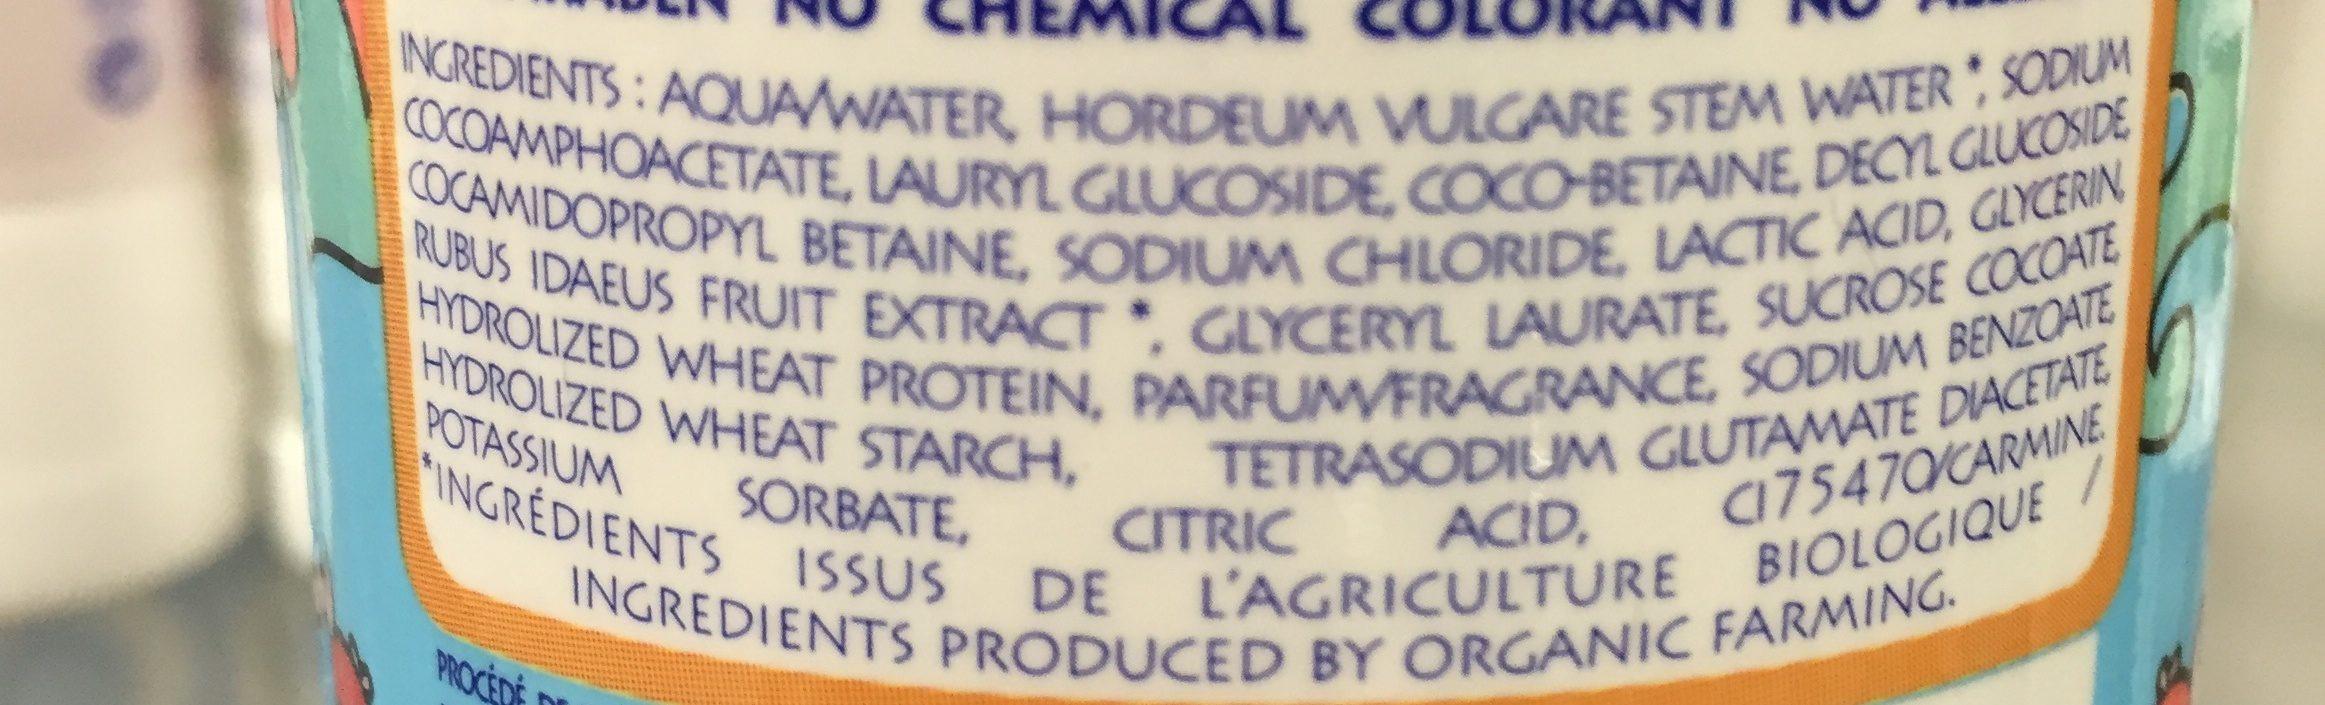 Planet Kid - Shampoing Framboise Démêlage Bio - Ingredients - fr